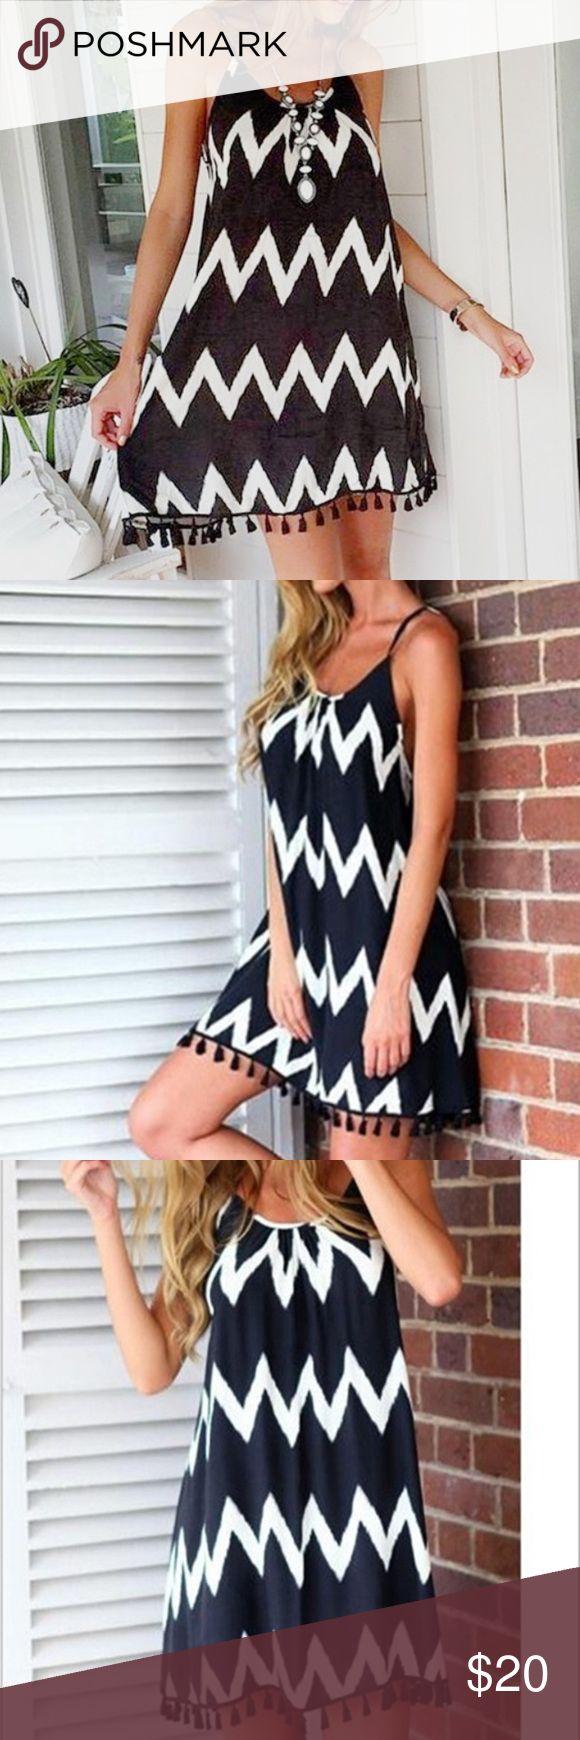 ☀️JUST IN☀️ Beach dress in black and white Tassel edged black and white chevron patterned spaghetti strap chiffon beach dress. Dresses